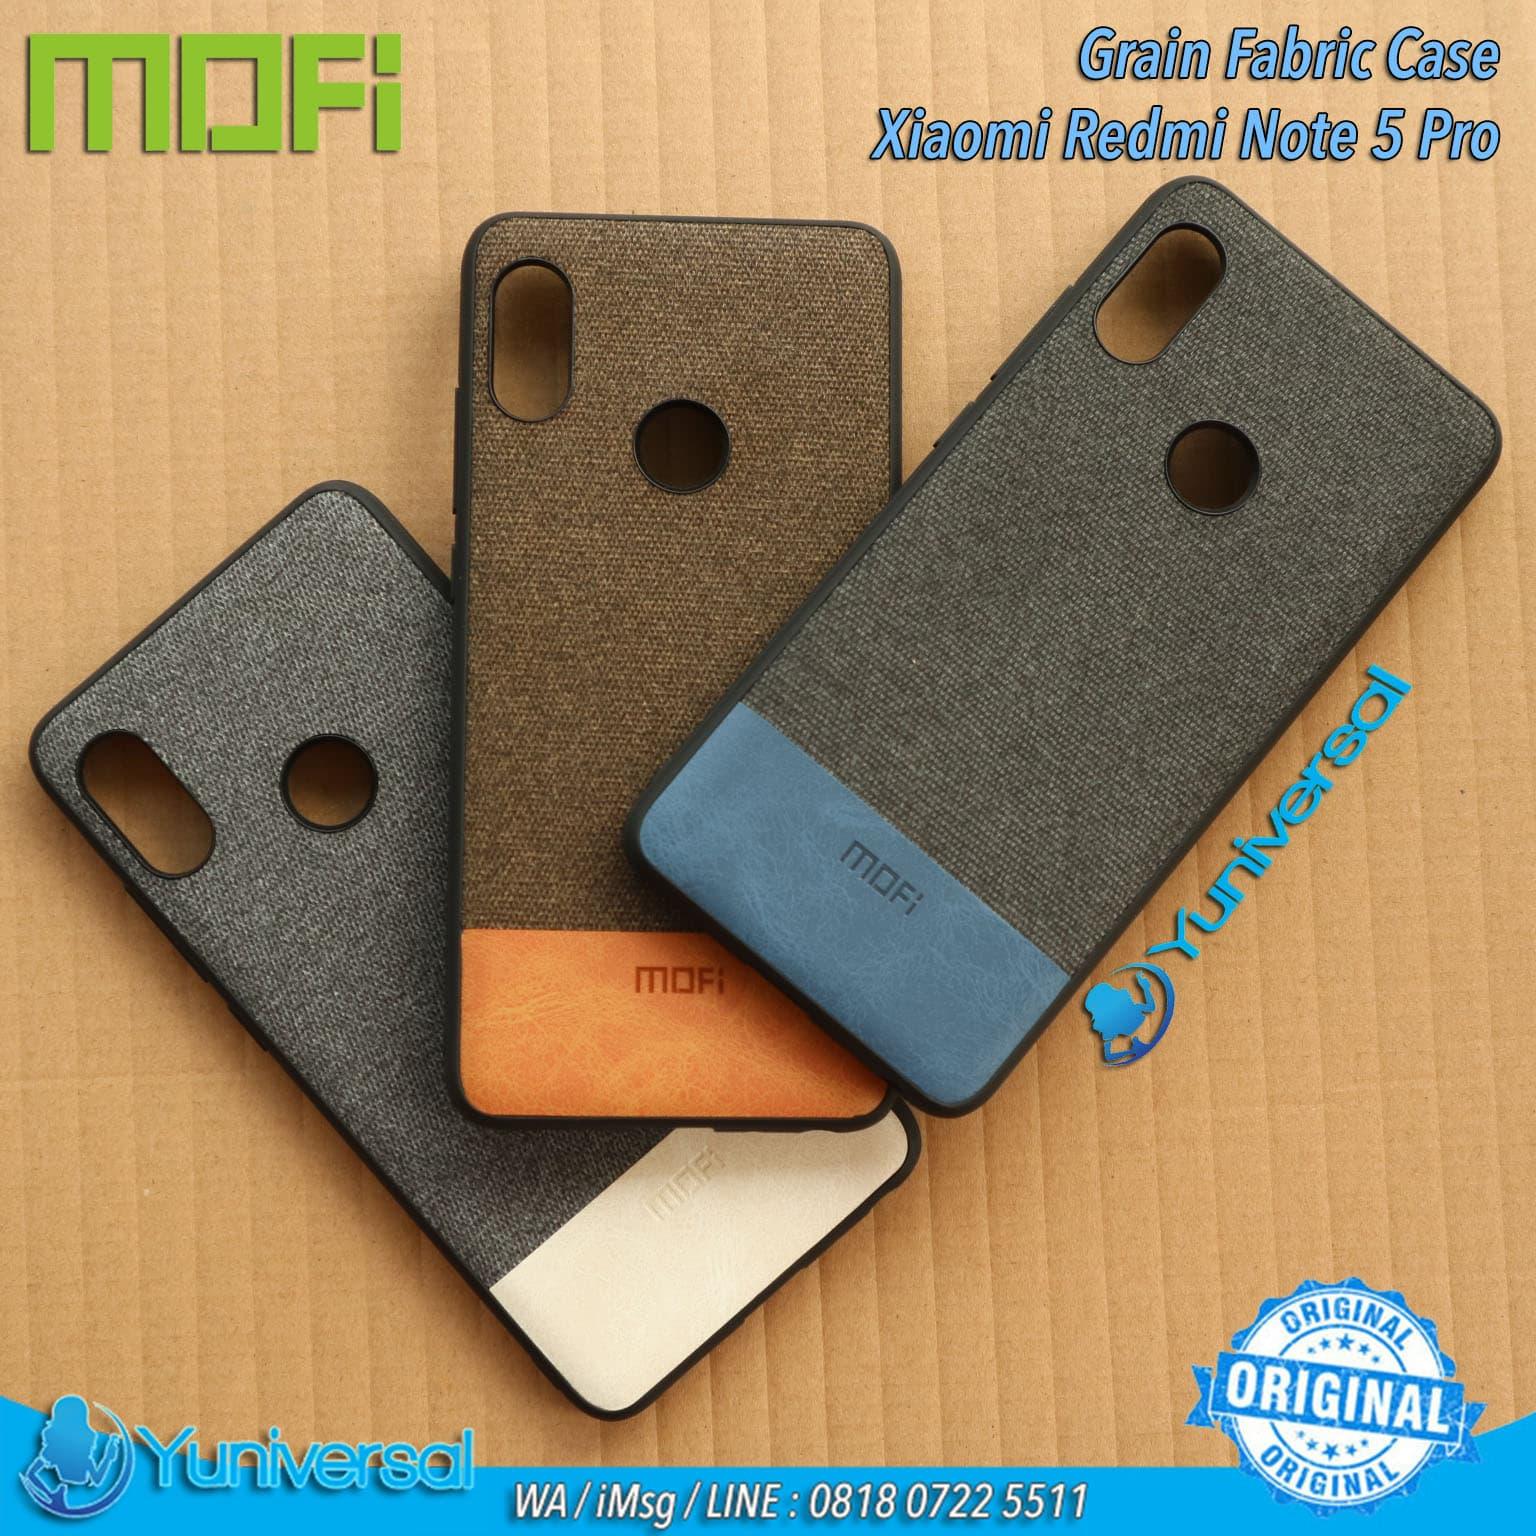 new style 19b50 7f119 Mofi Redmi Note 5 Pro Fabric Grain Case Xiaomi Ultrahin Original - Black  Blue